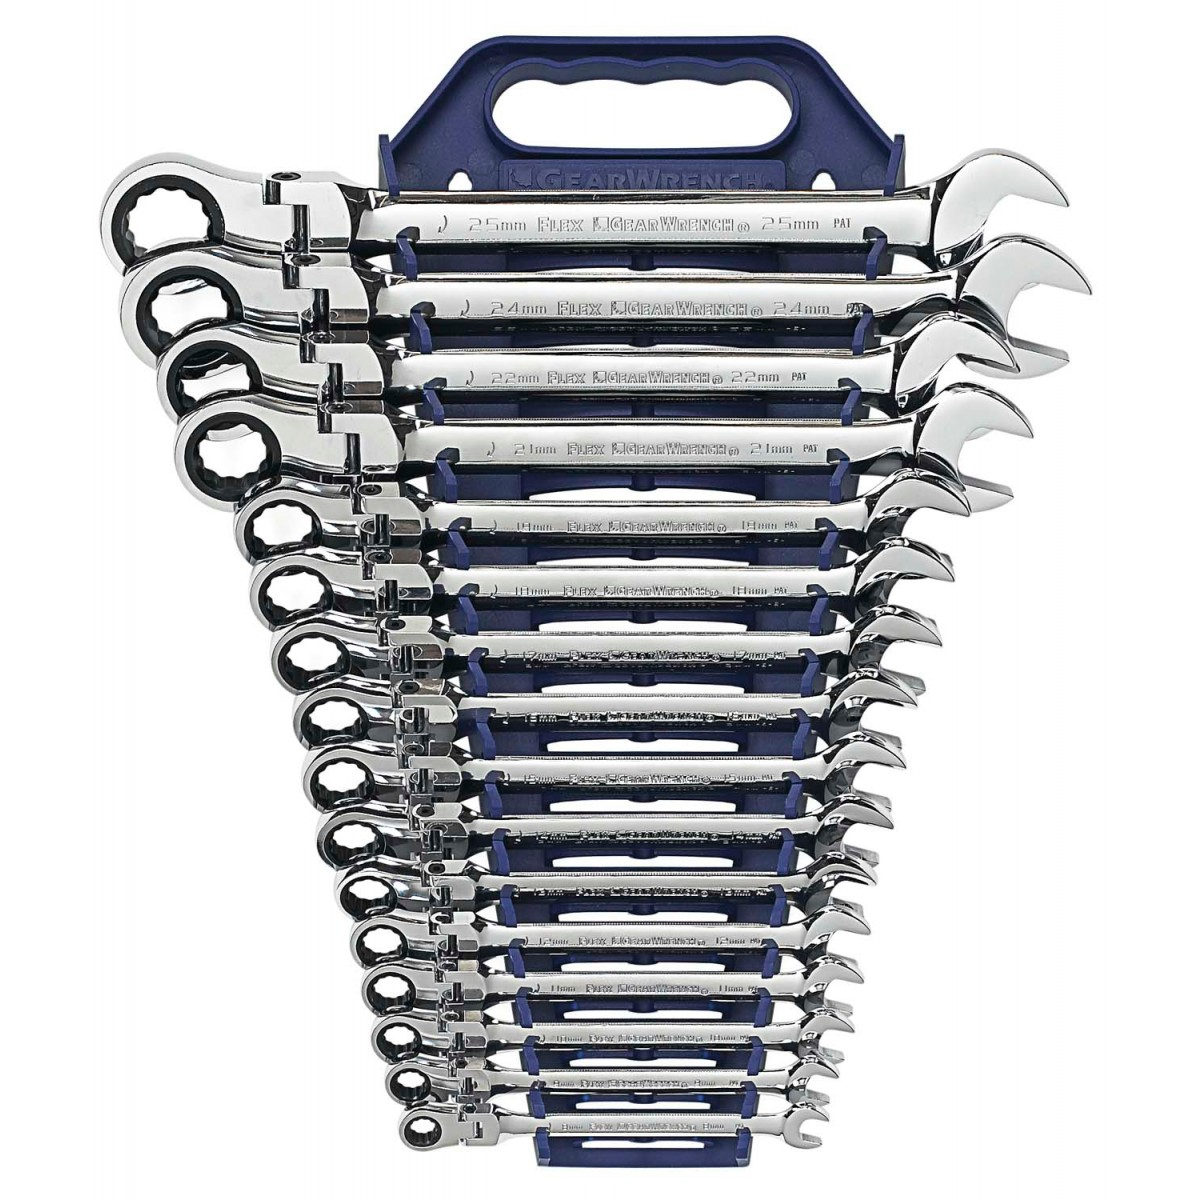 Kd Tools Gearwrench 9902 Metric Flex Head Combination